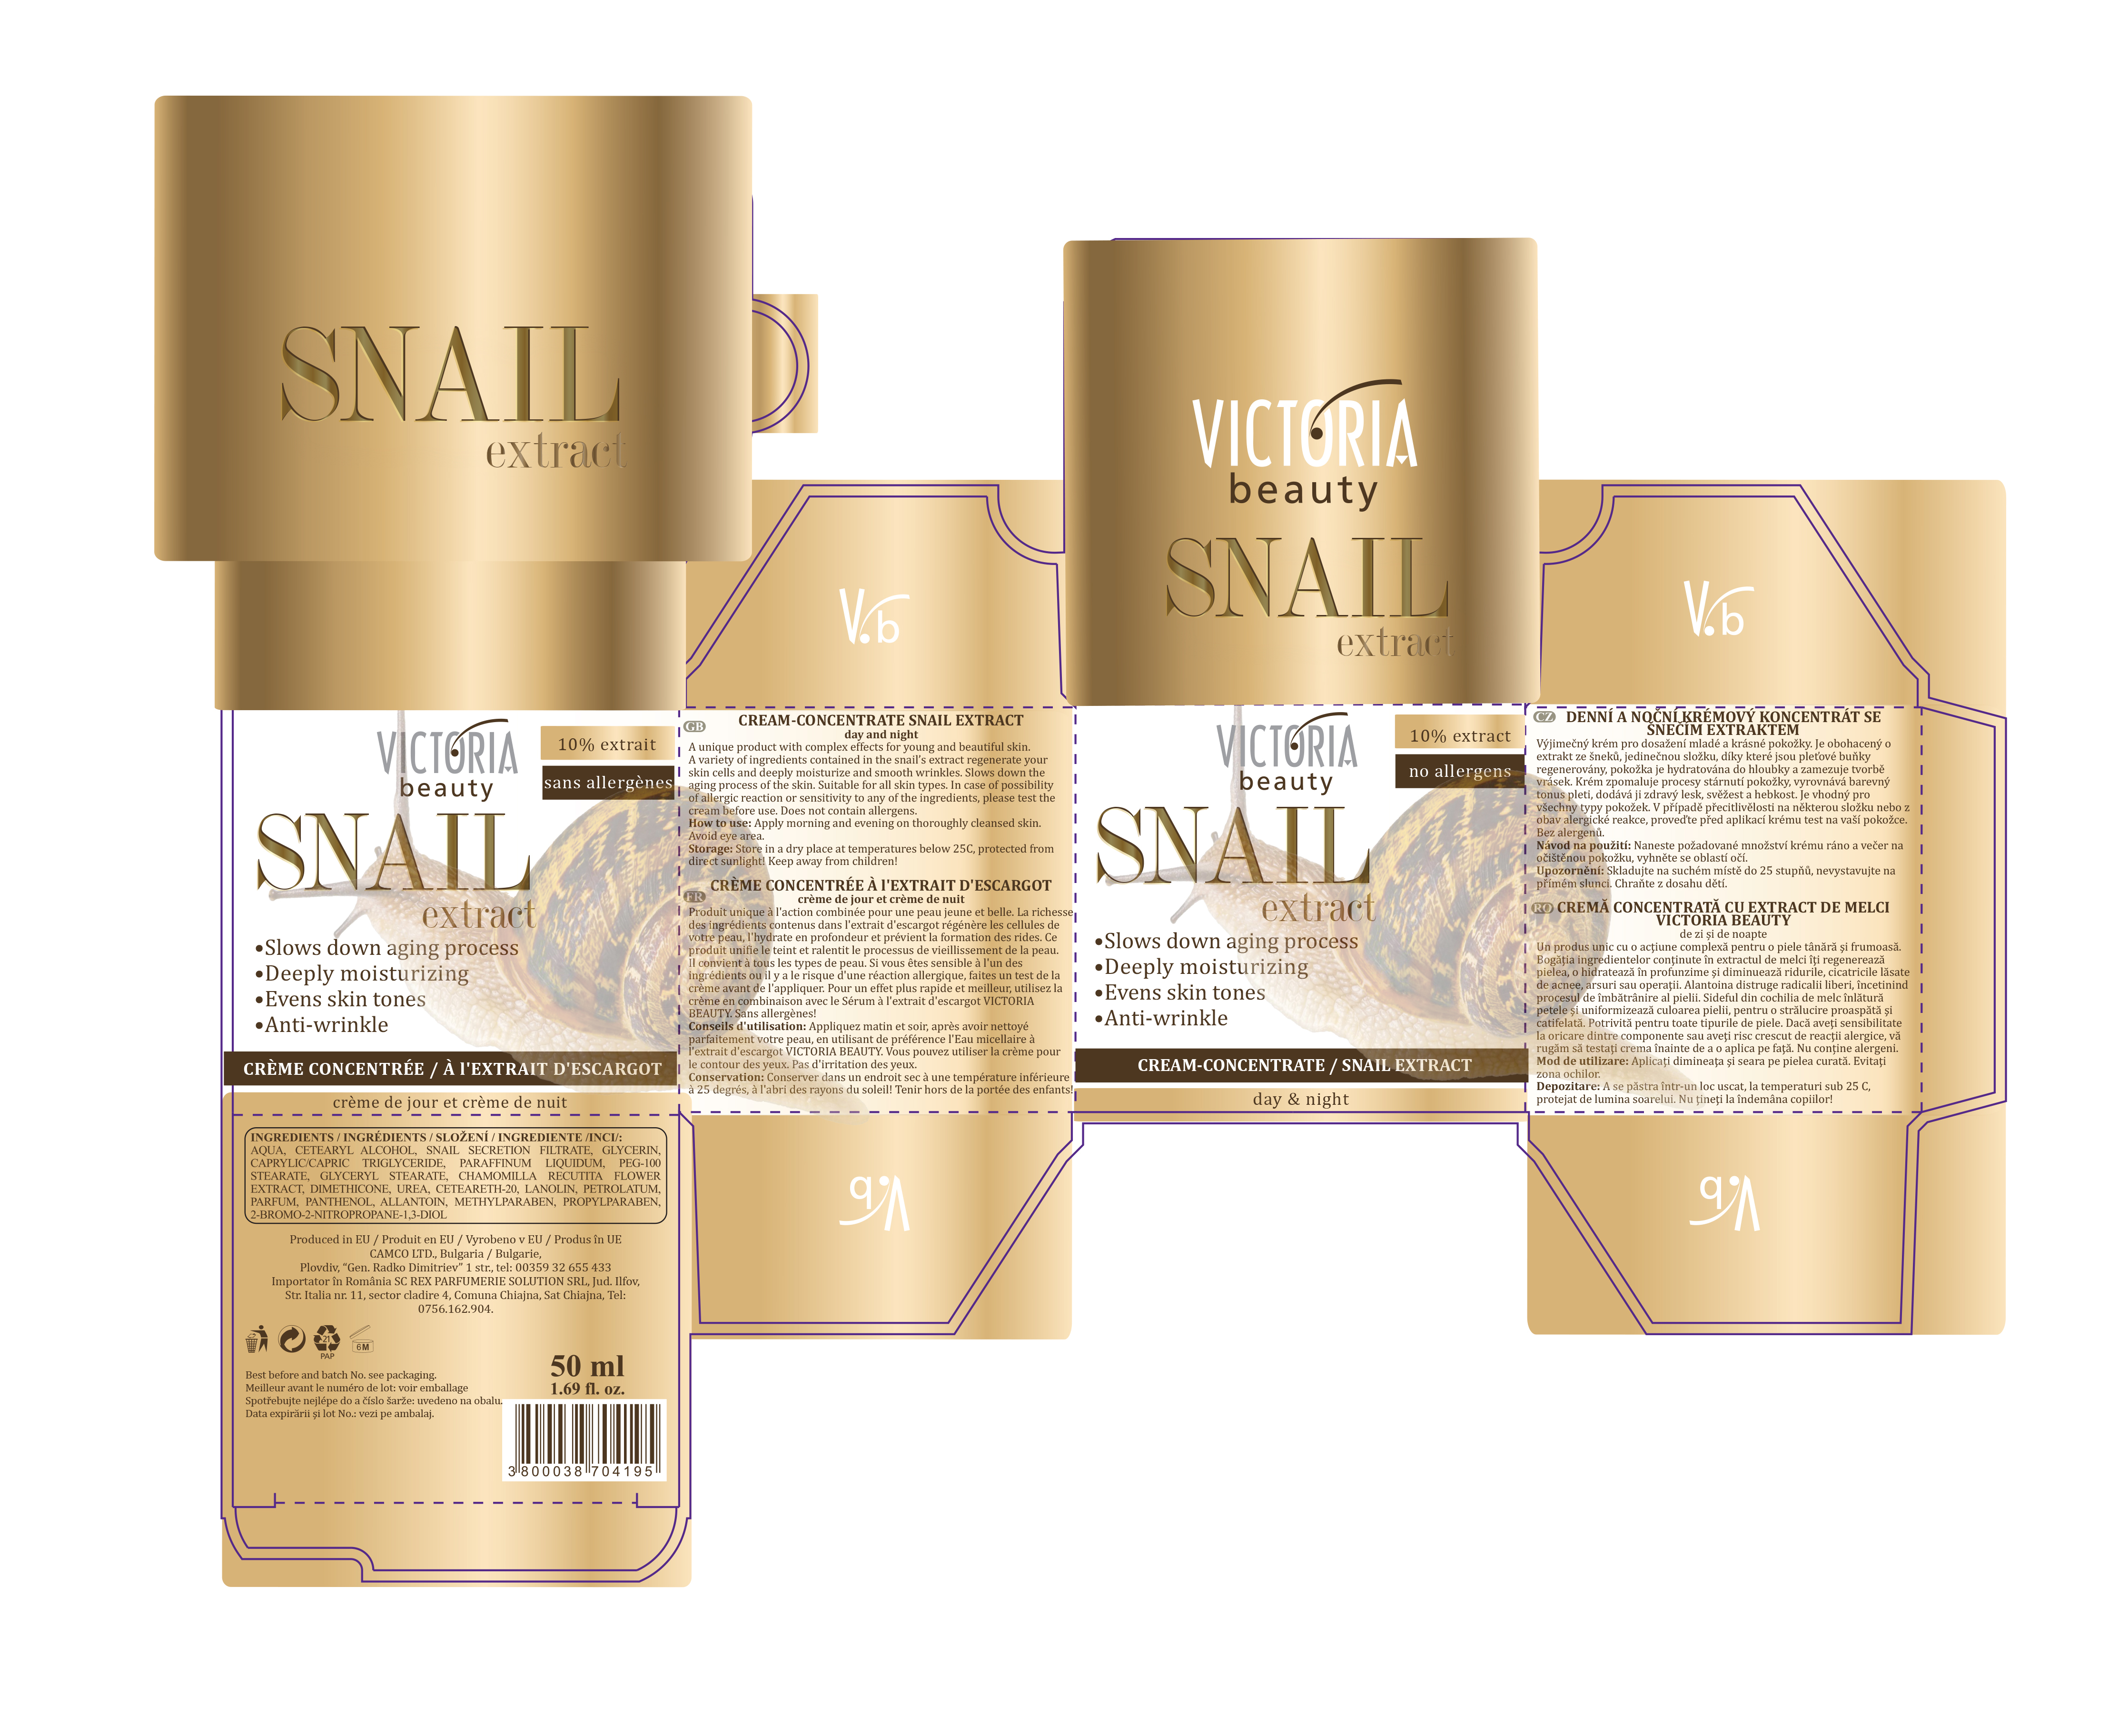 FR_Snail extract Дневен крем за лице кутия